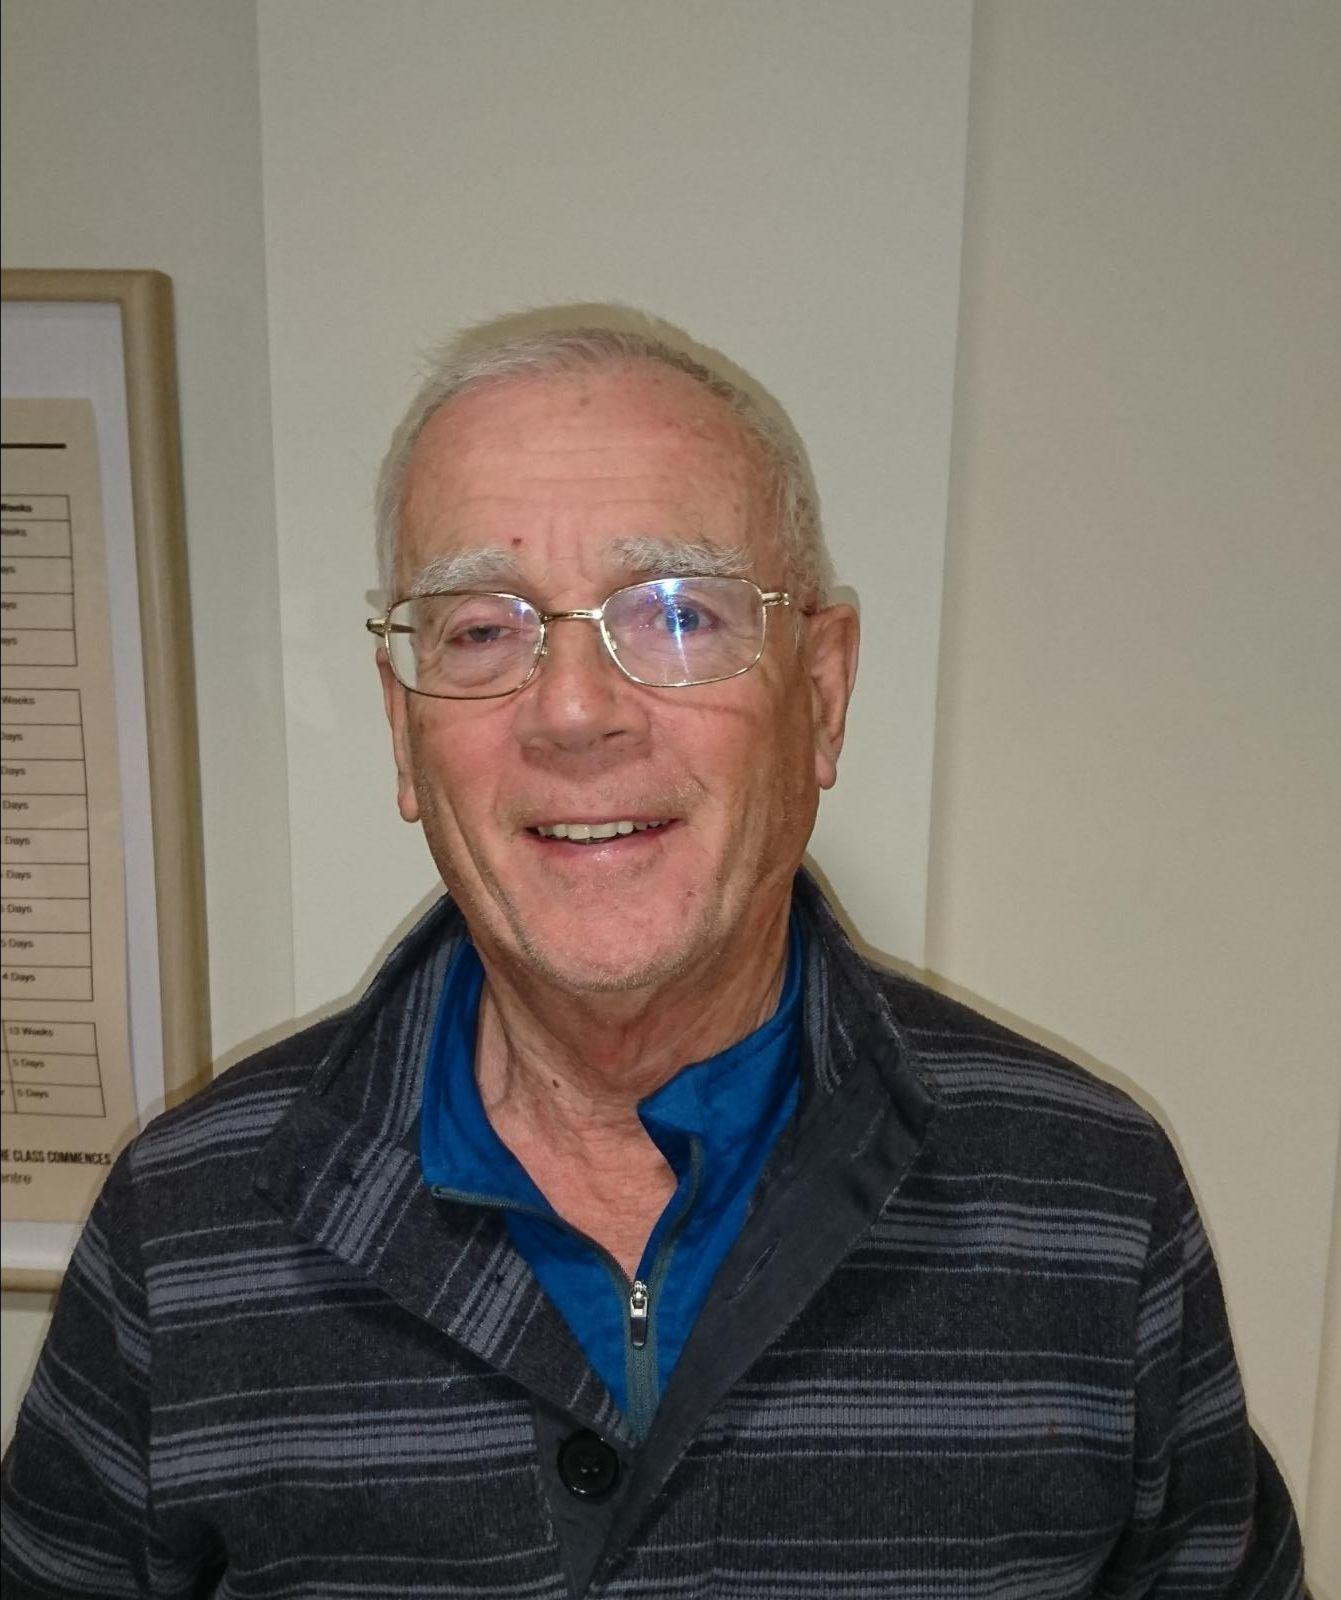 Ricky Palmer, President & Treasurer